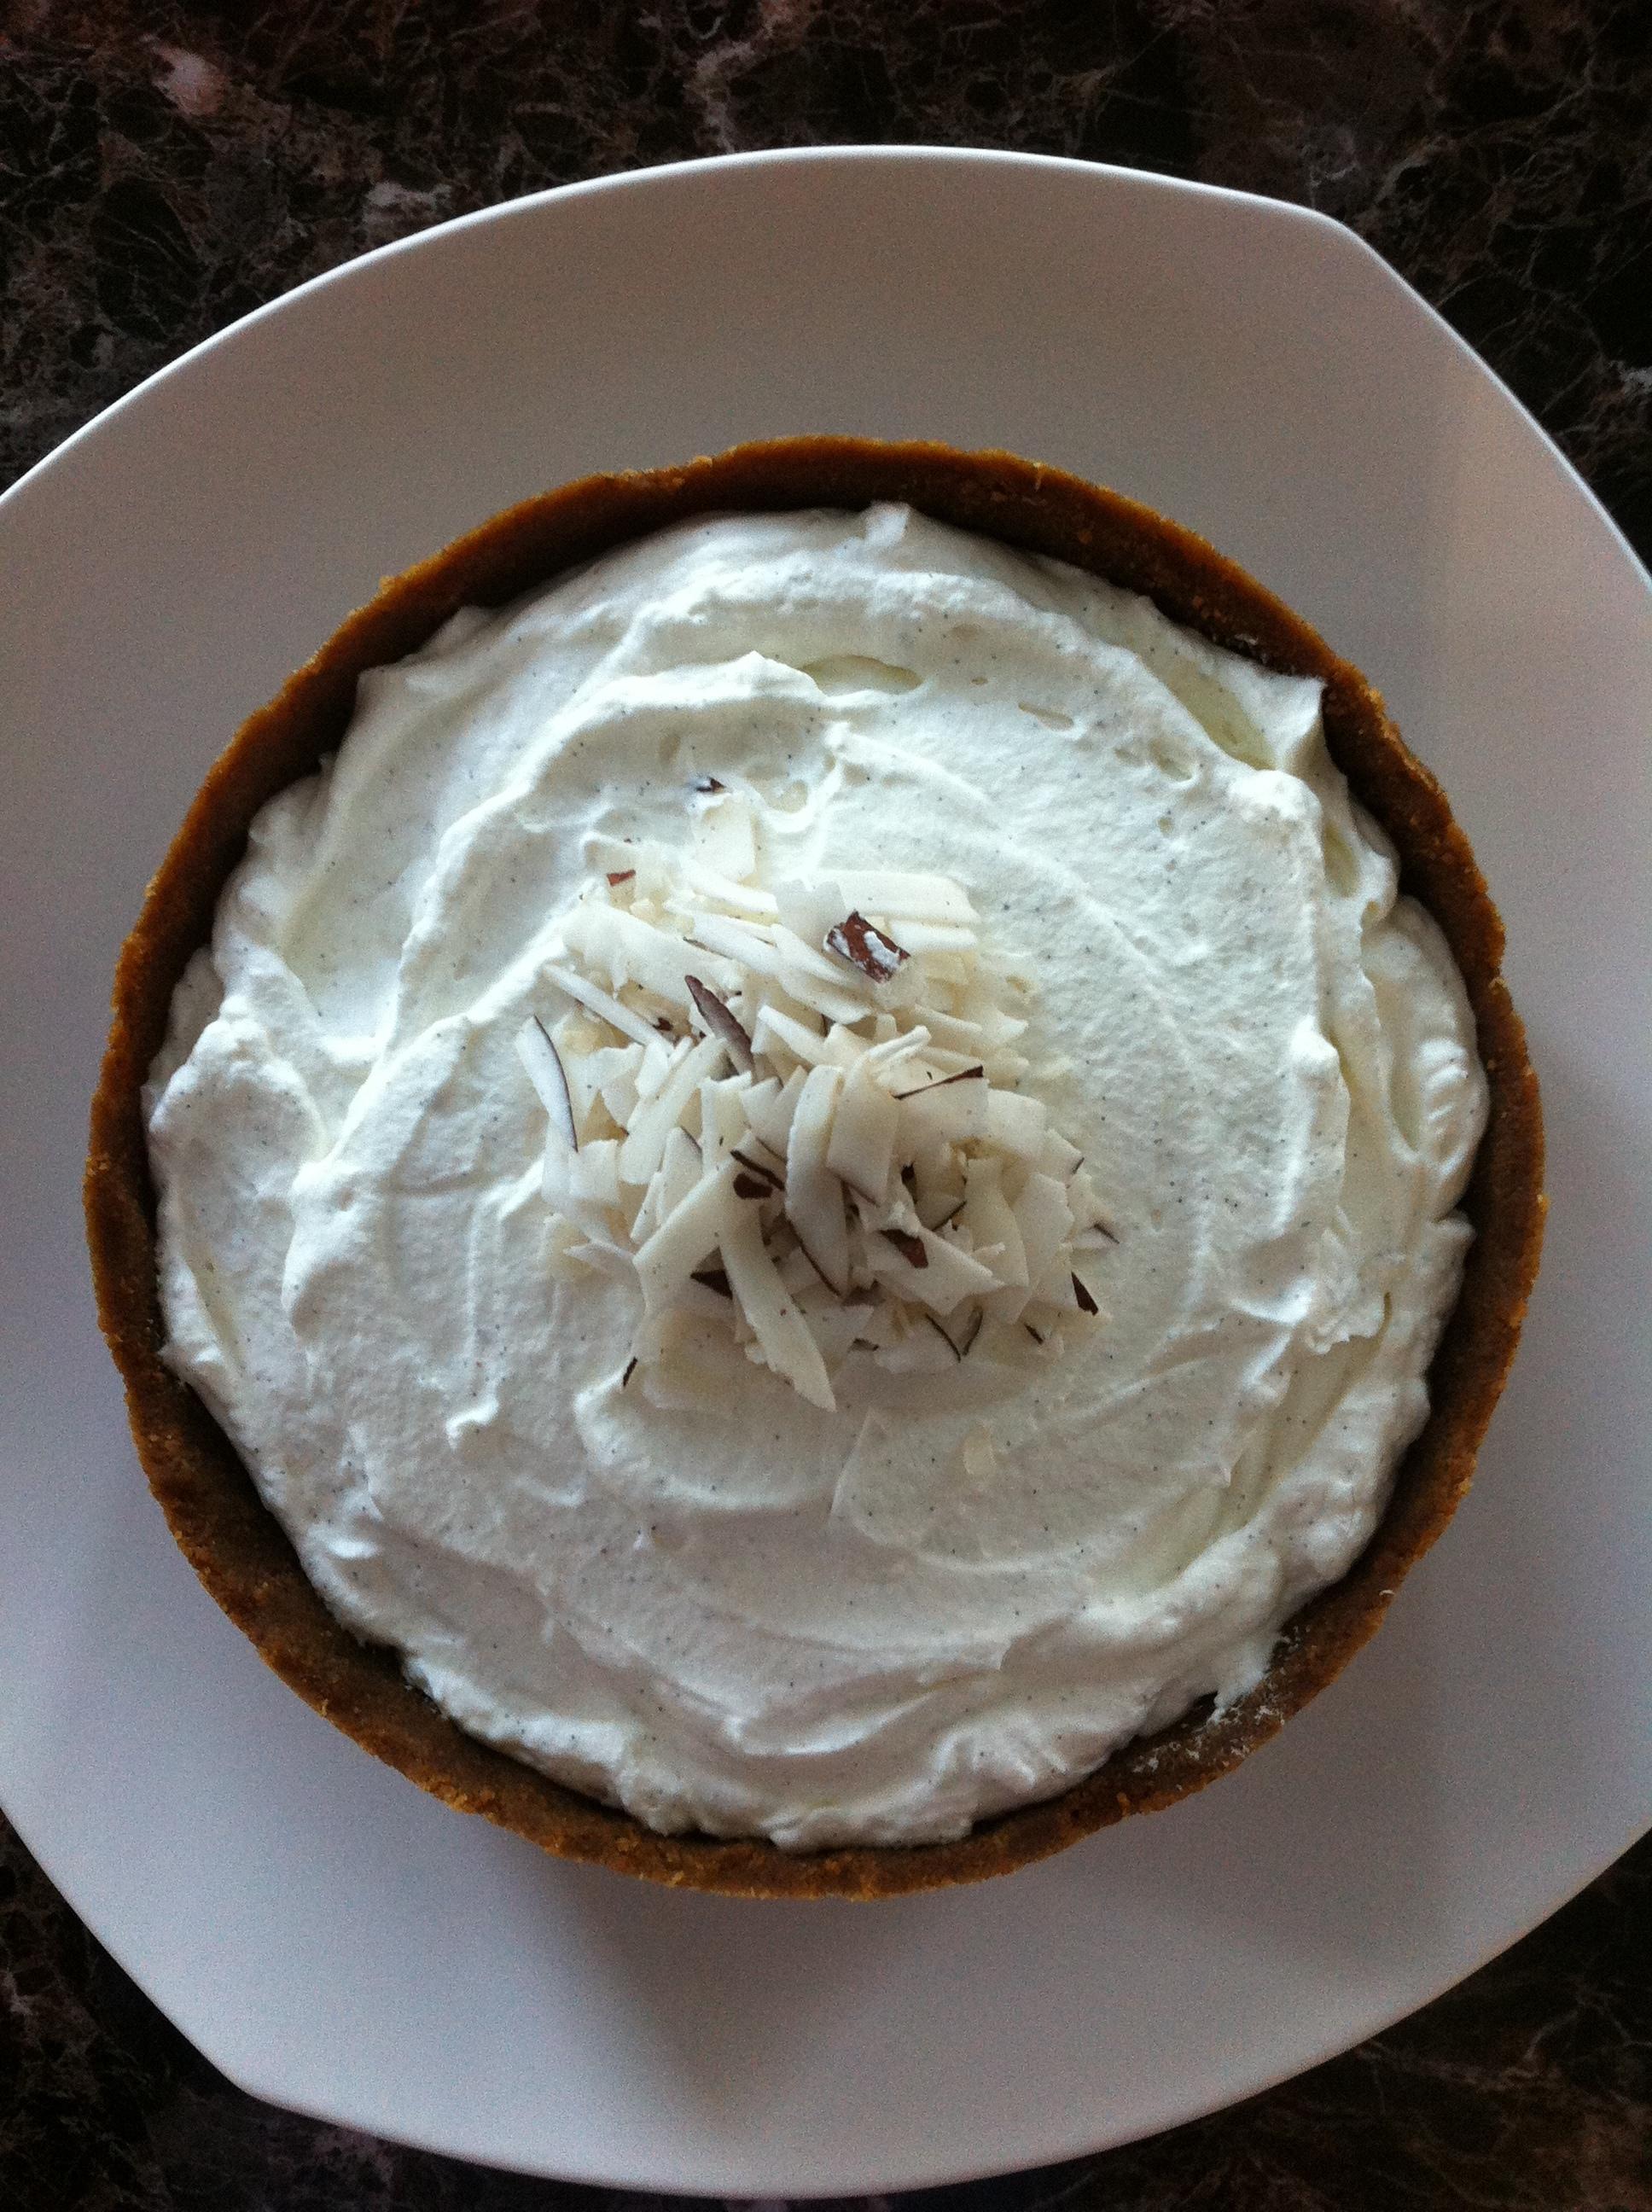 No Bake Coconut Cream Pie with Fair Trade Ingredients